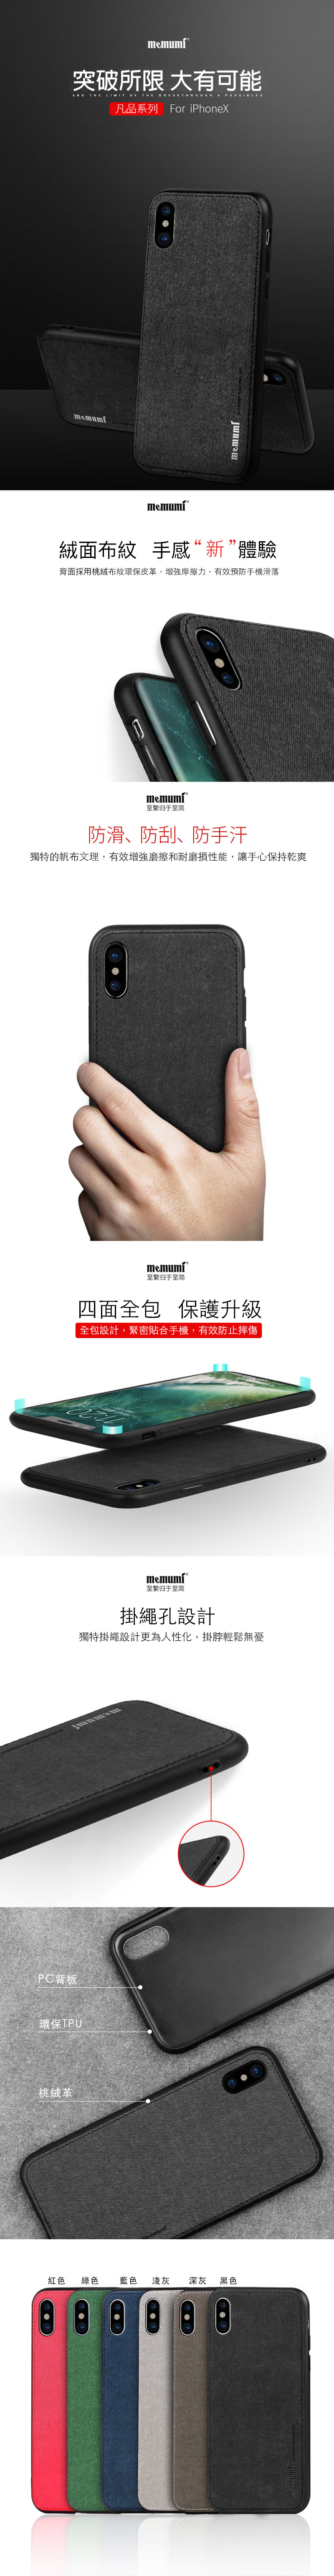 Memumi 麥麥米 為原始手感之美而生 絨布系列保護殼 for iPhone X